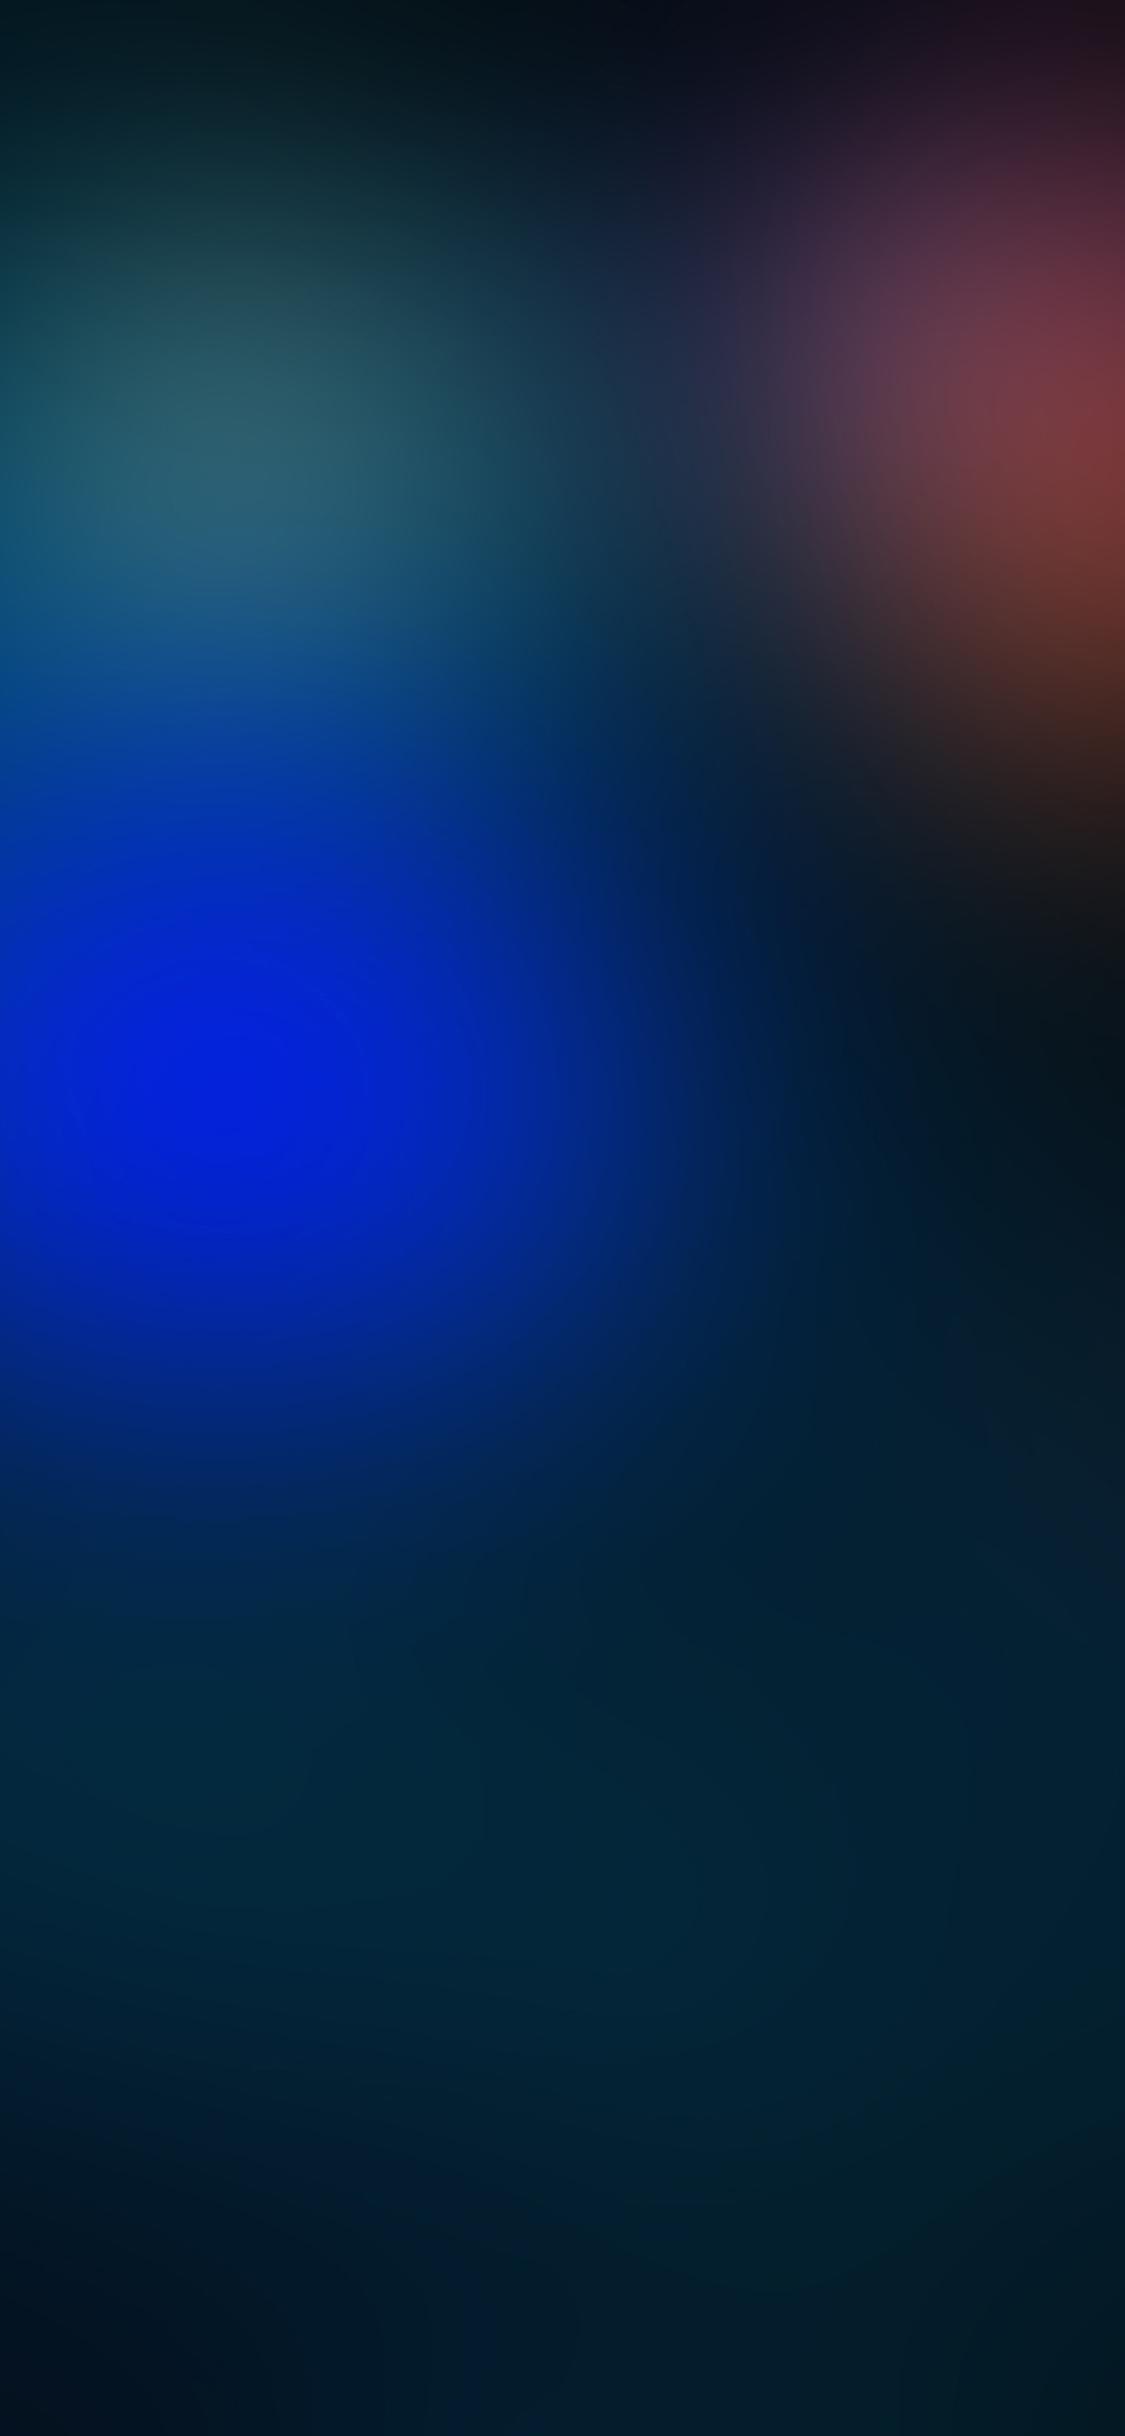 iPhoneXpapers.com-Apple-iPhone-wallpaper-sa36-blurred-lights-night-blur